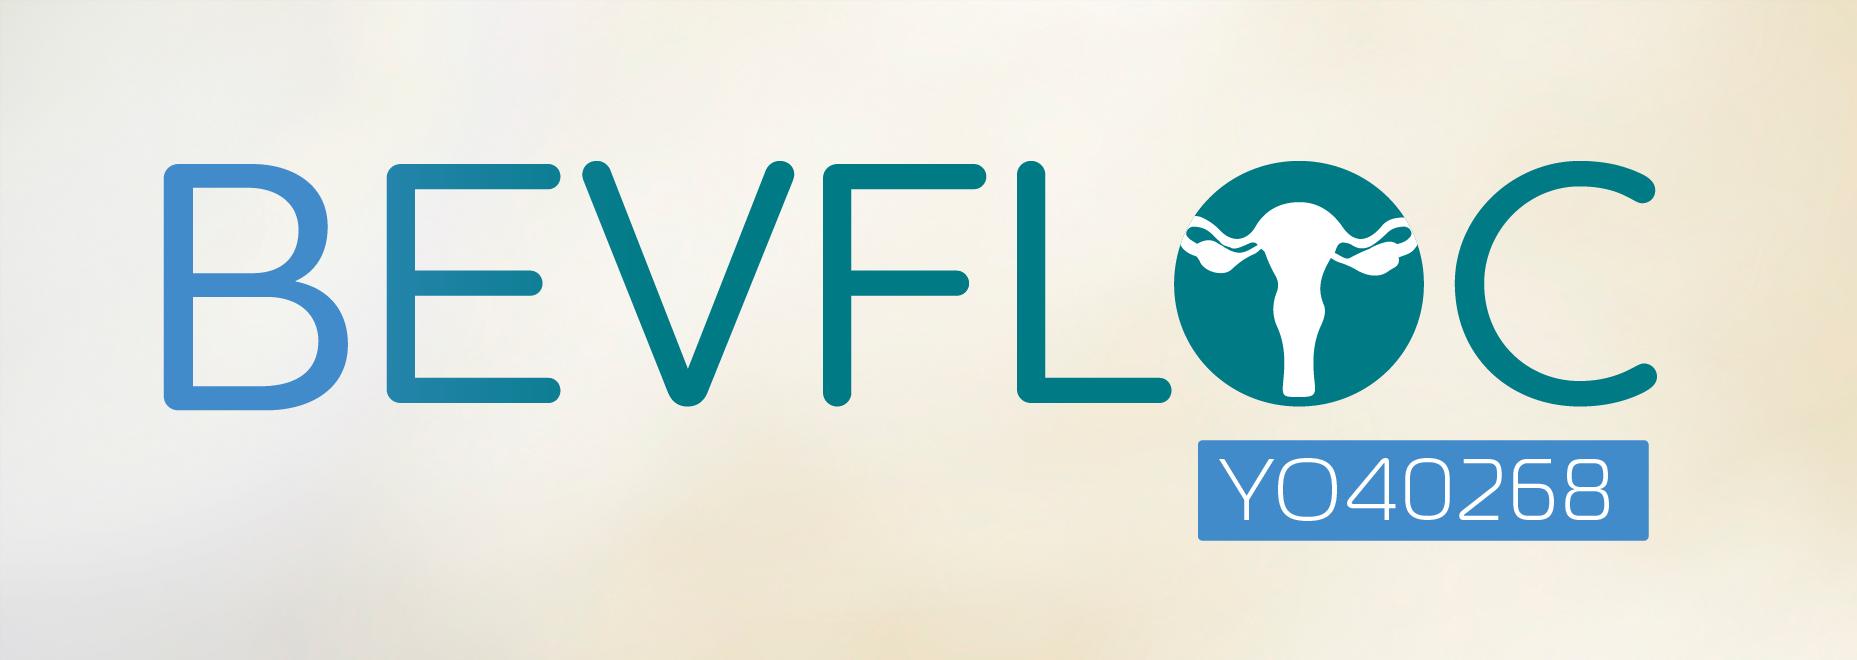 Bevfloc logo